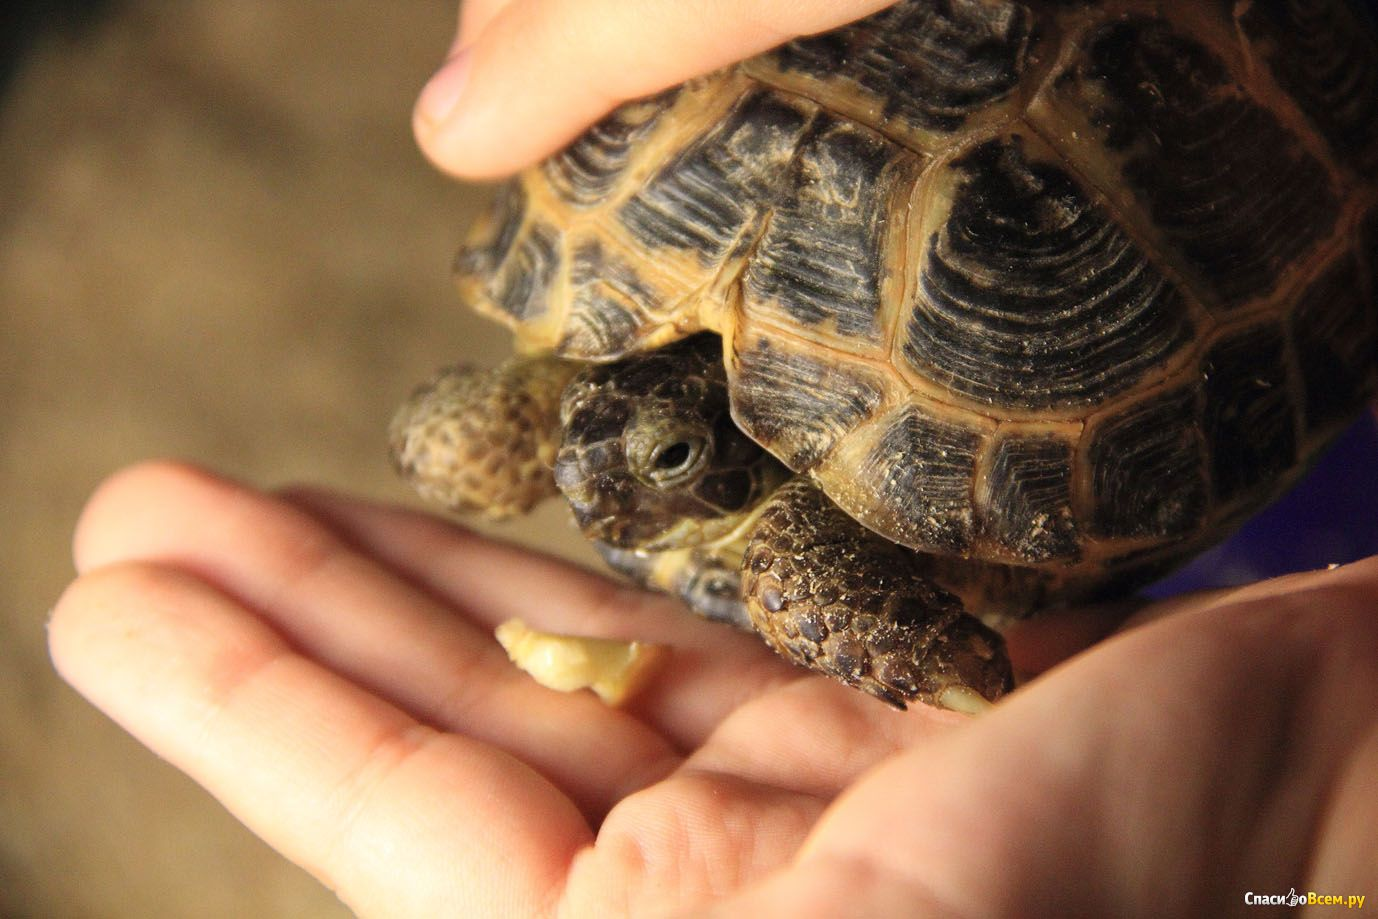 Сколько живут черепахи в домашних условиях 81